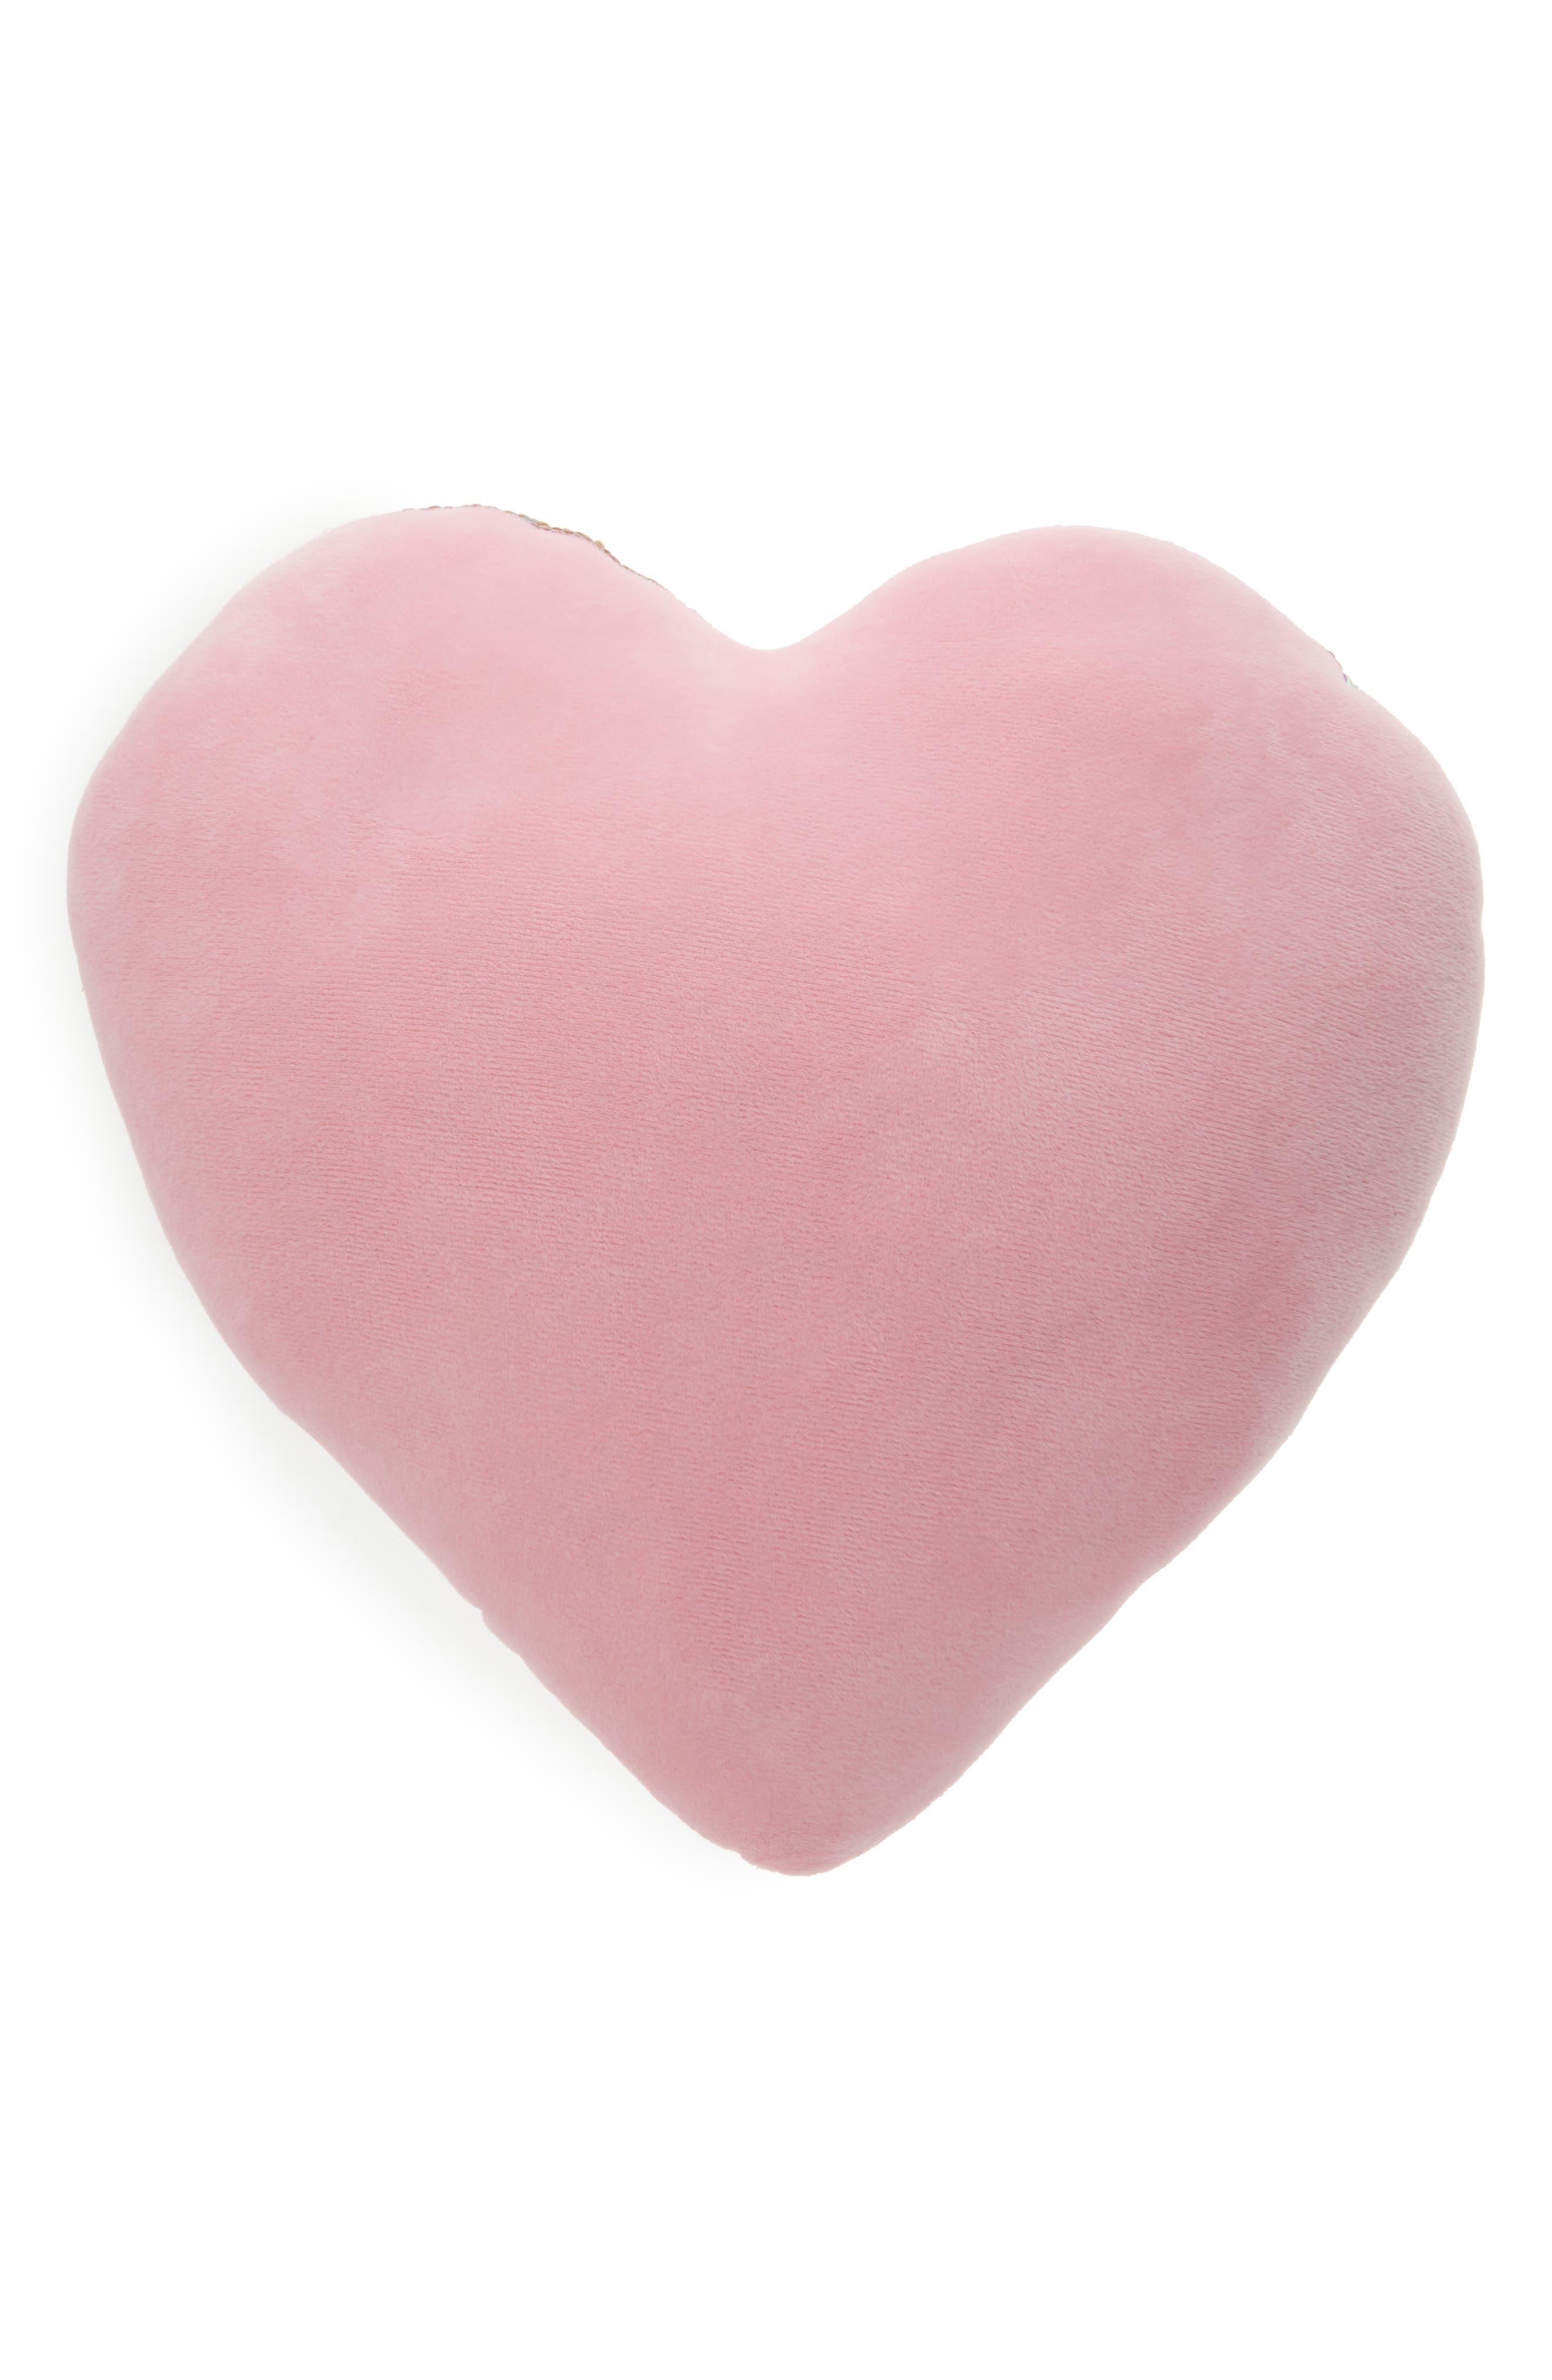 Flip Sequin Love Pillow,                             Alternate thumbnail 2, color,                             ROSE GOLD